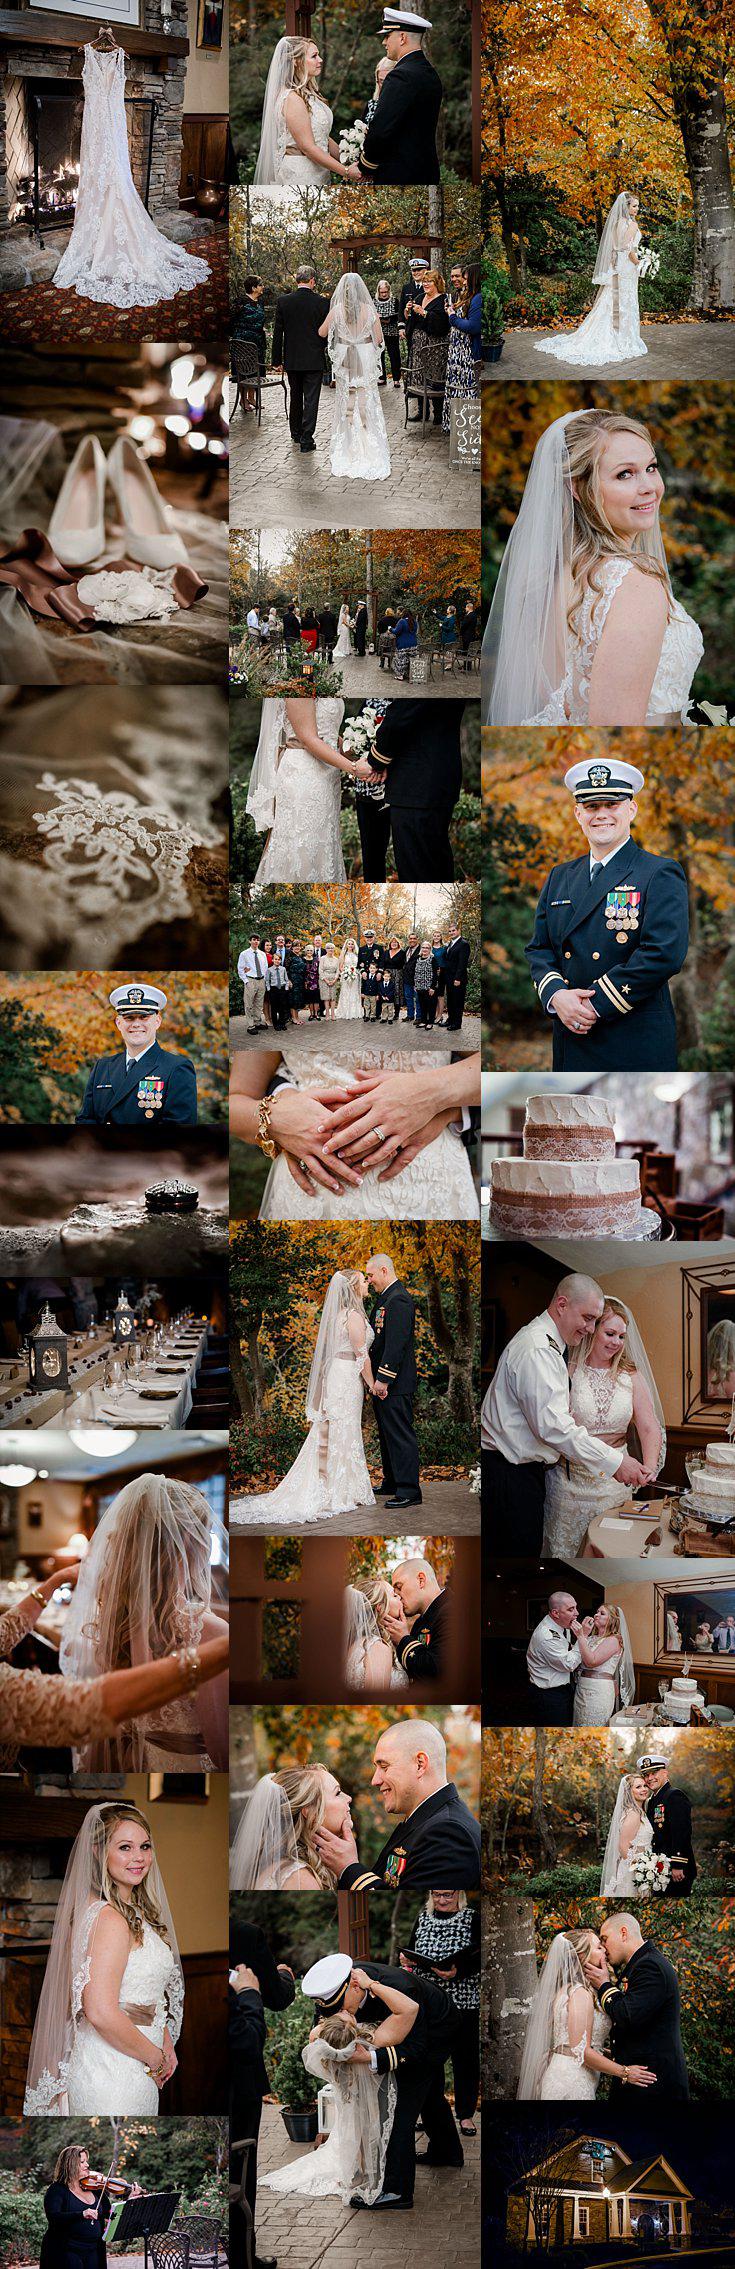 fall-wedding-autumn-outdoor-wedding-bride-military-groom-cream-brown-ivory-fall-wedding-inspiration-beautiful-photography-real-weddings-melissa-bliss-photography-hampton-roads-va-photographer-vintage-tavern-suffolk.jpg